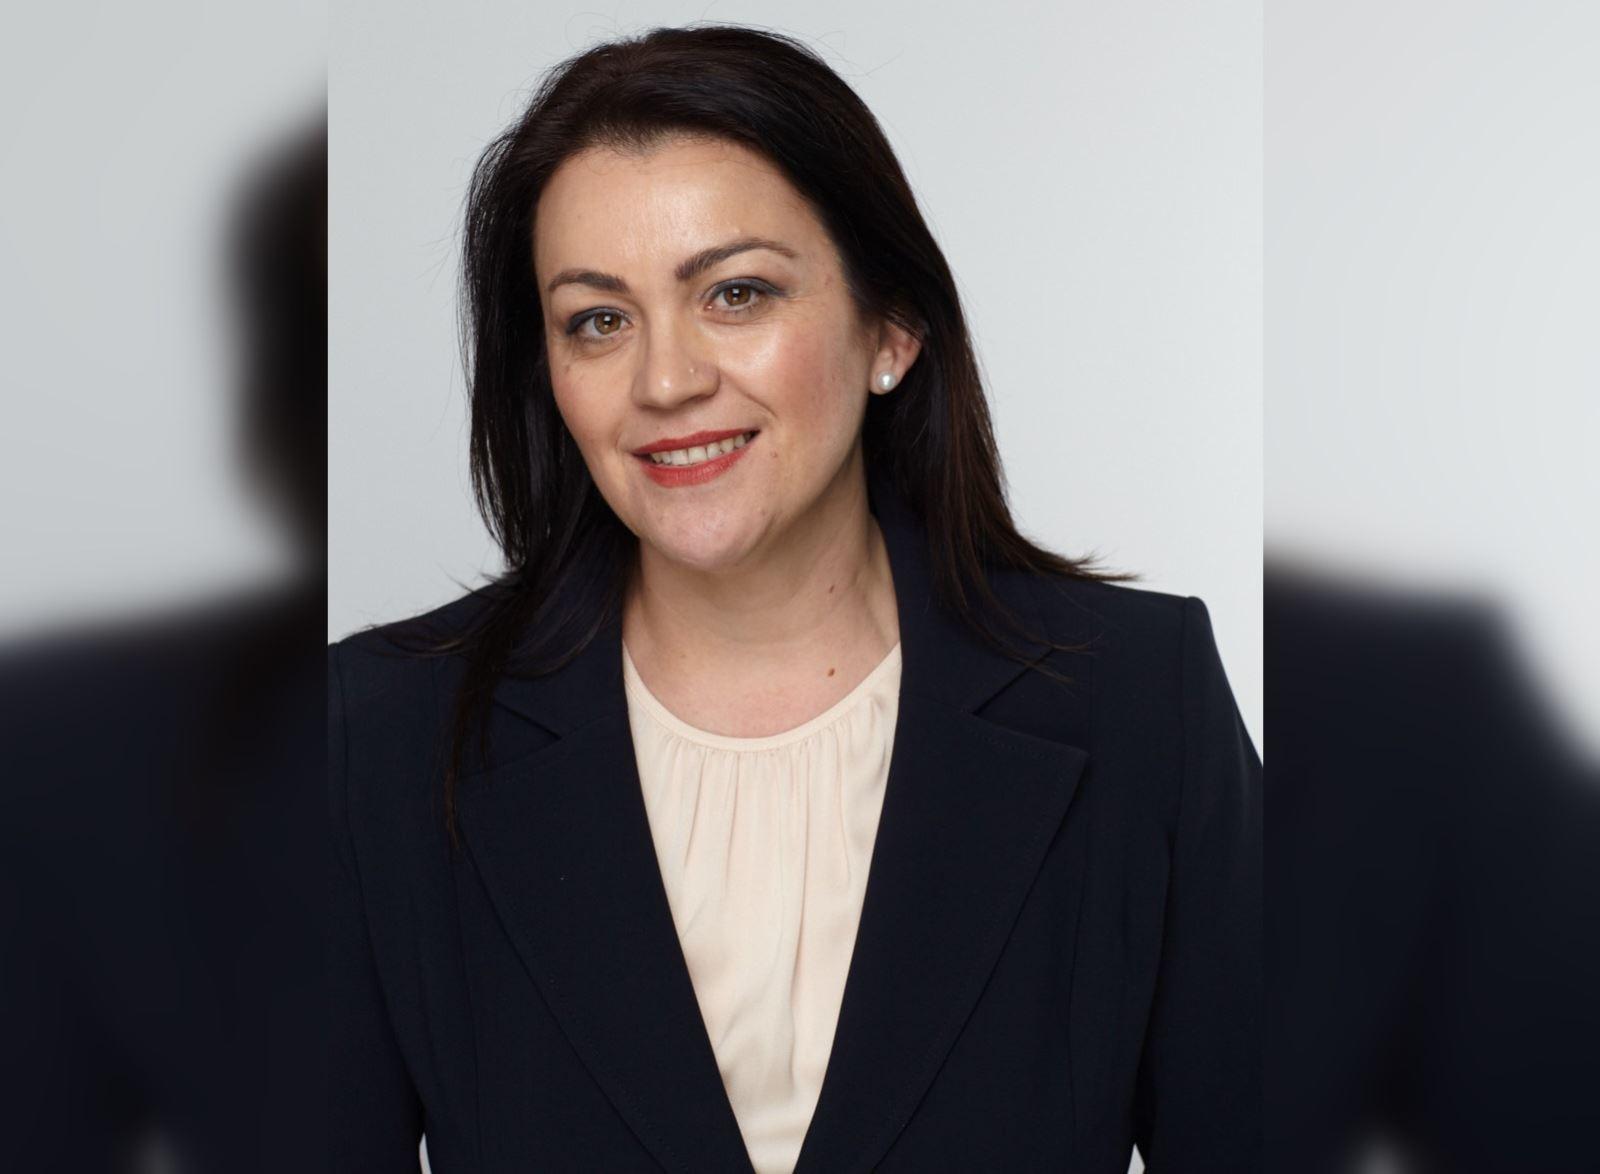 Snezana Jankulovski, Group HR director, COX Automotive Australia & New Zealand